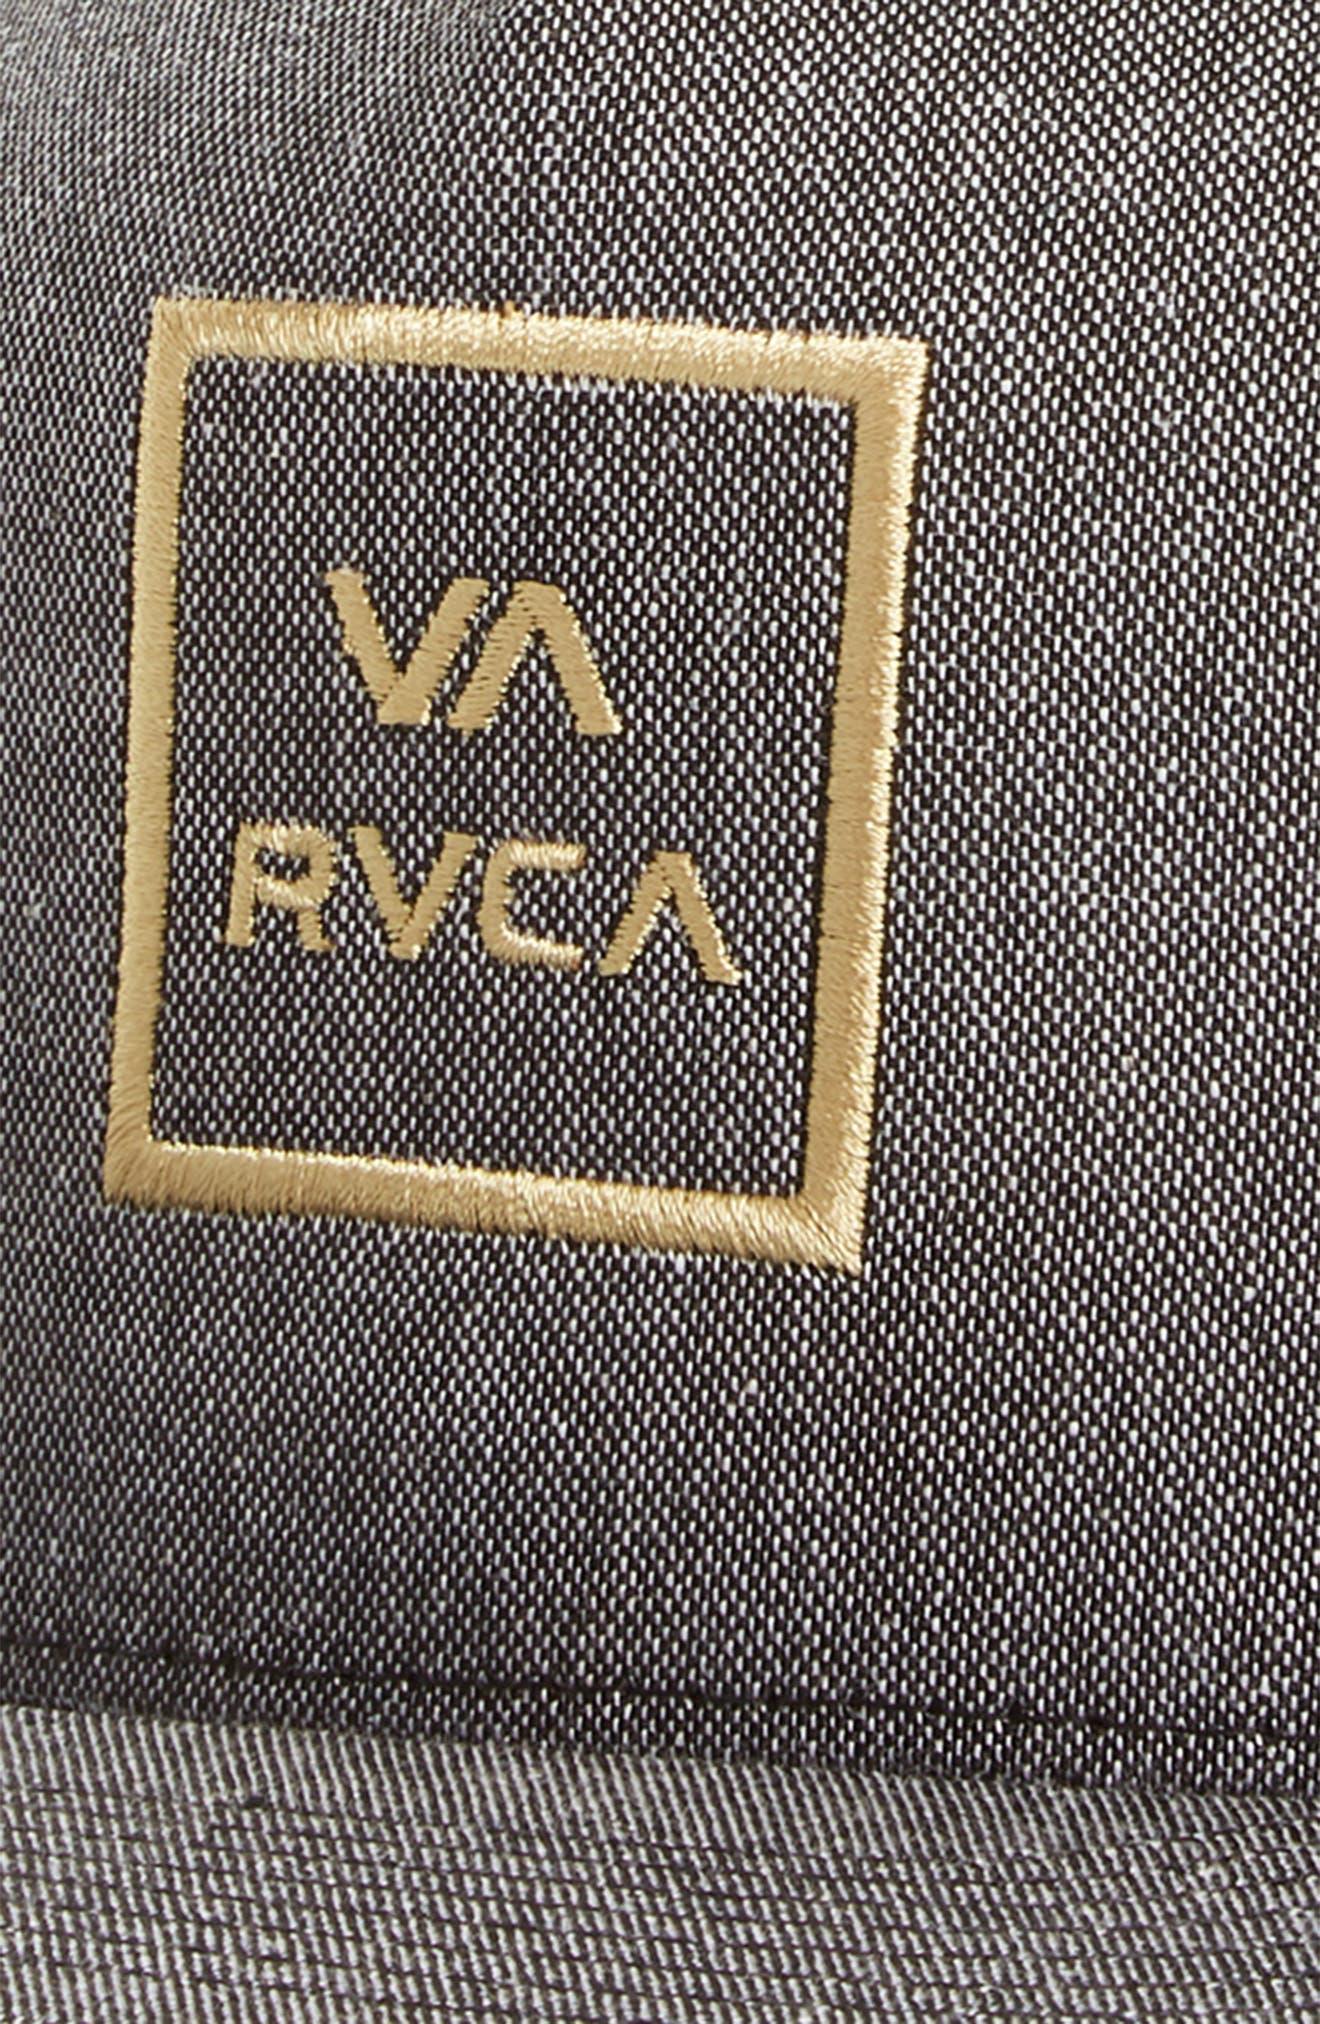 RVCA, VA All the Way Trucker Hat, Alternate thumbnail 3, color, DARK CHARCOAL HEATHER